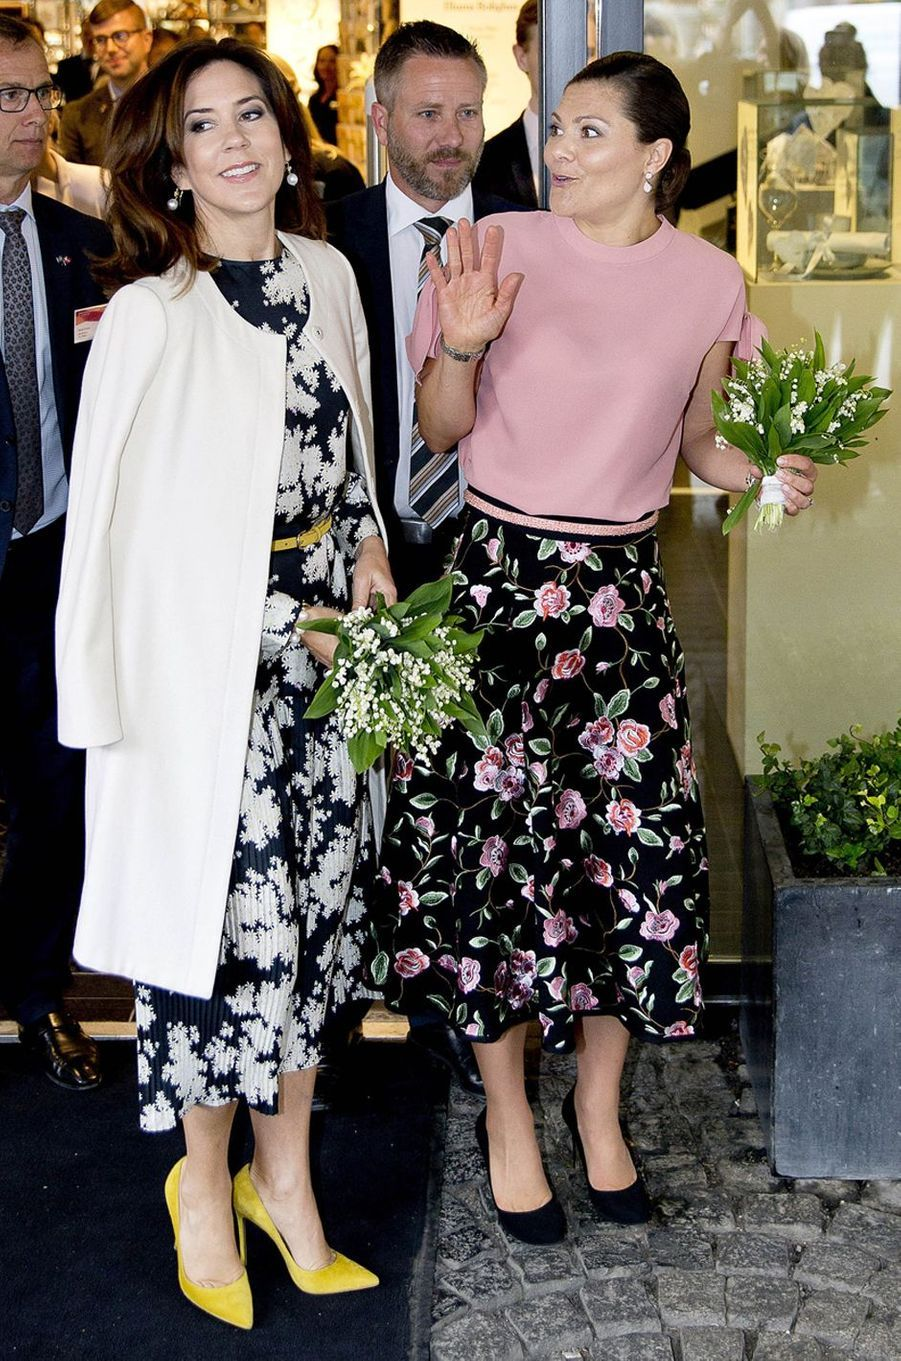 La princesse Victoria de Suède et la princesse Mary de Danemark le 30 mai 2017